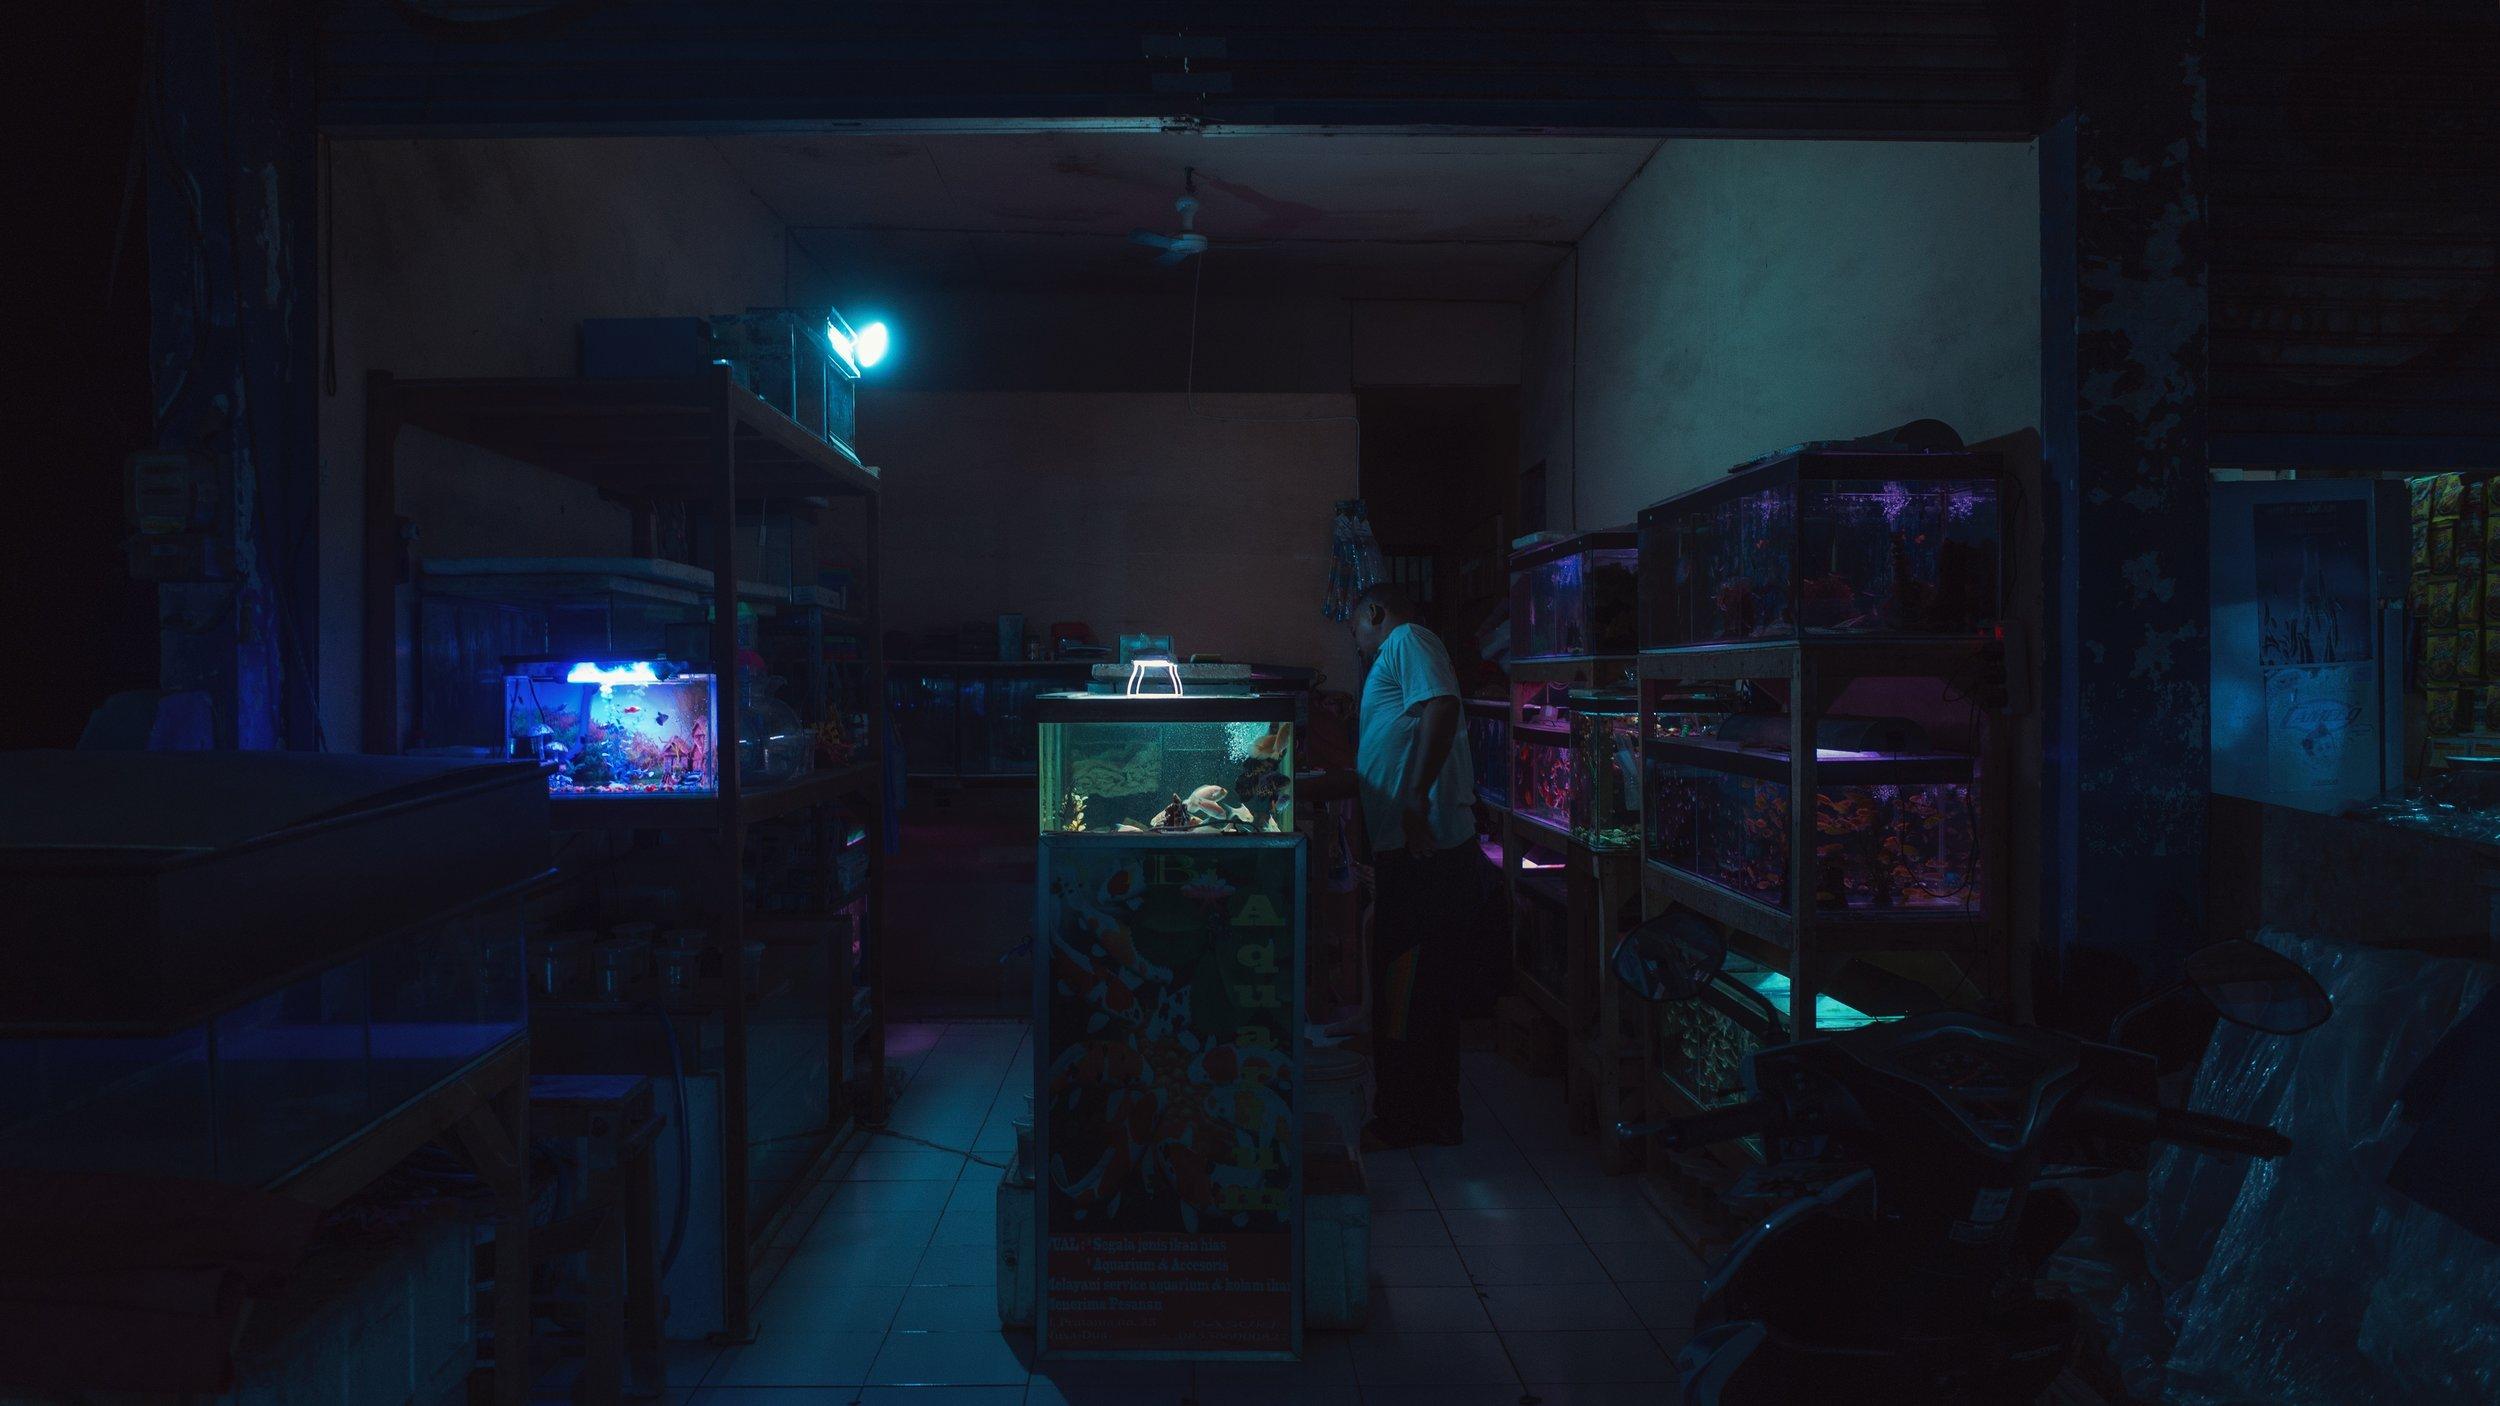 bali fish shop by jevgenij tichonov.JPG